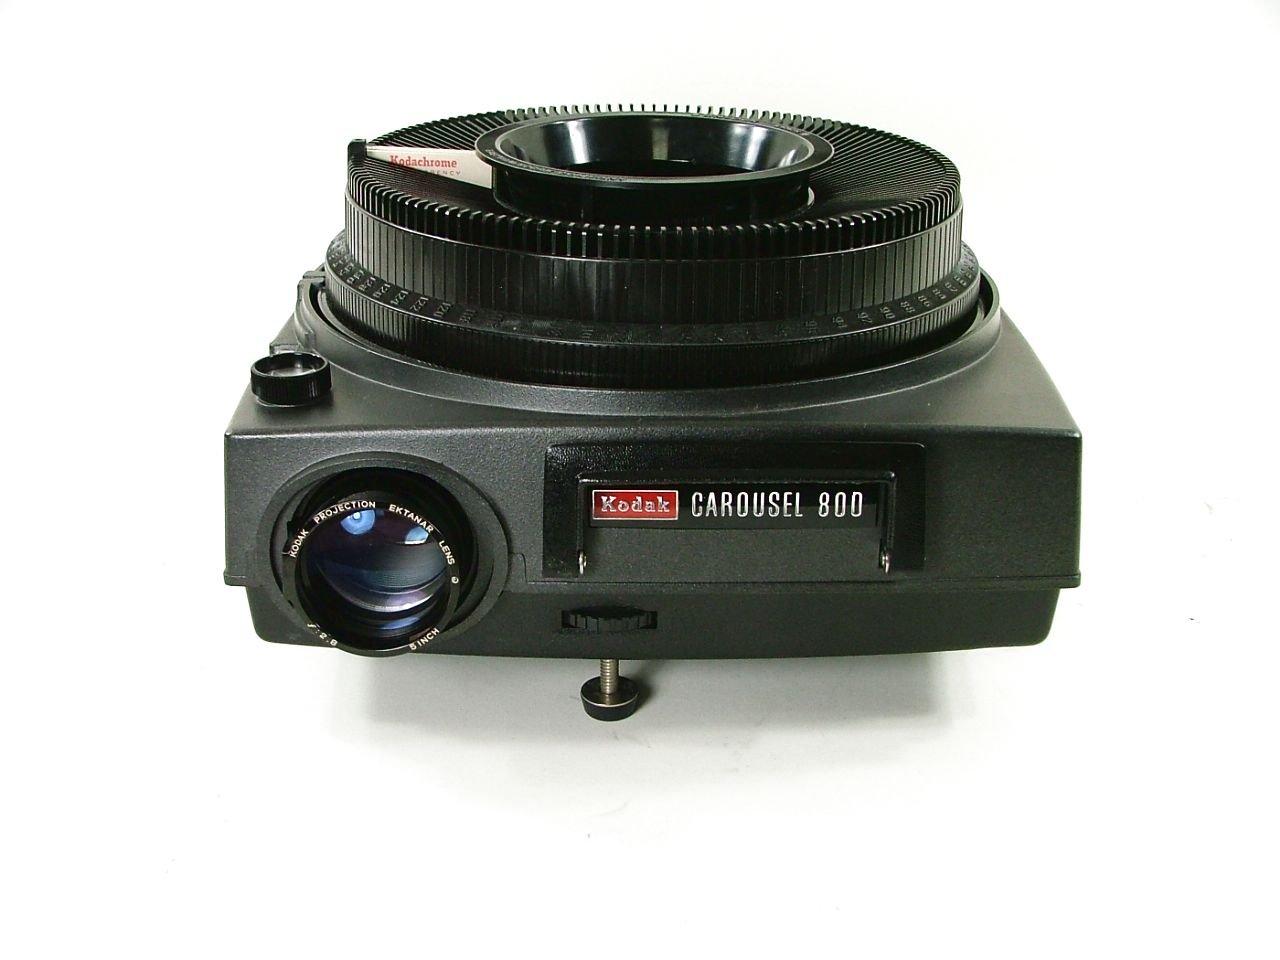 amazon com kodak carousel 800 35mm slide projector timer dual rh amazon com Kodak Carousel Ad Kodak Carousel Slide Projector